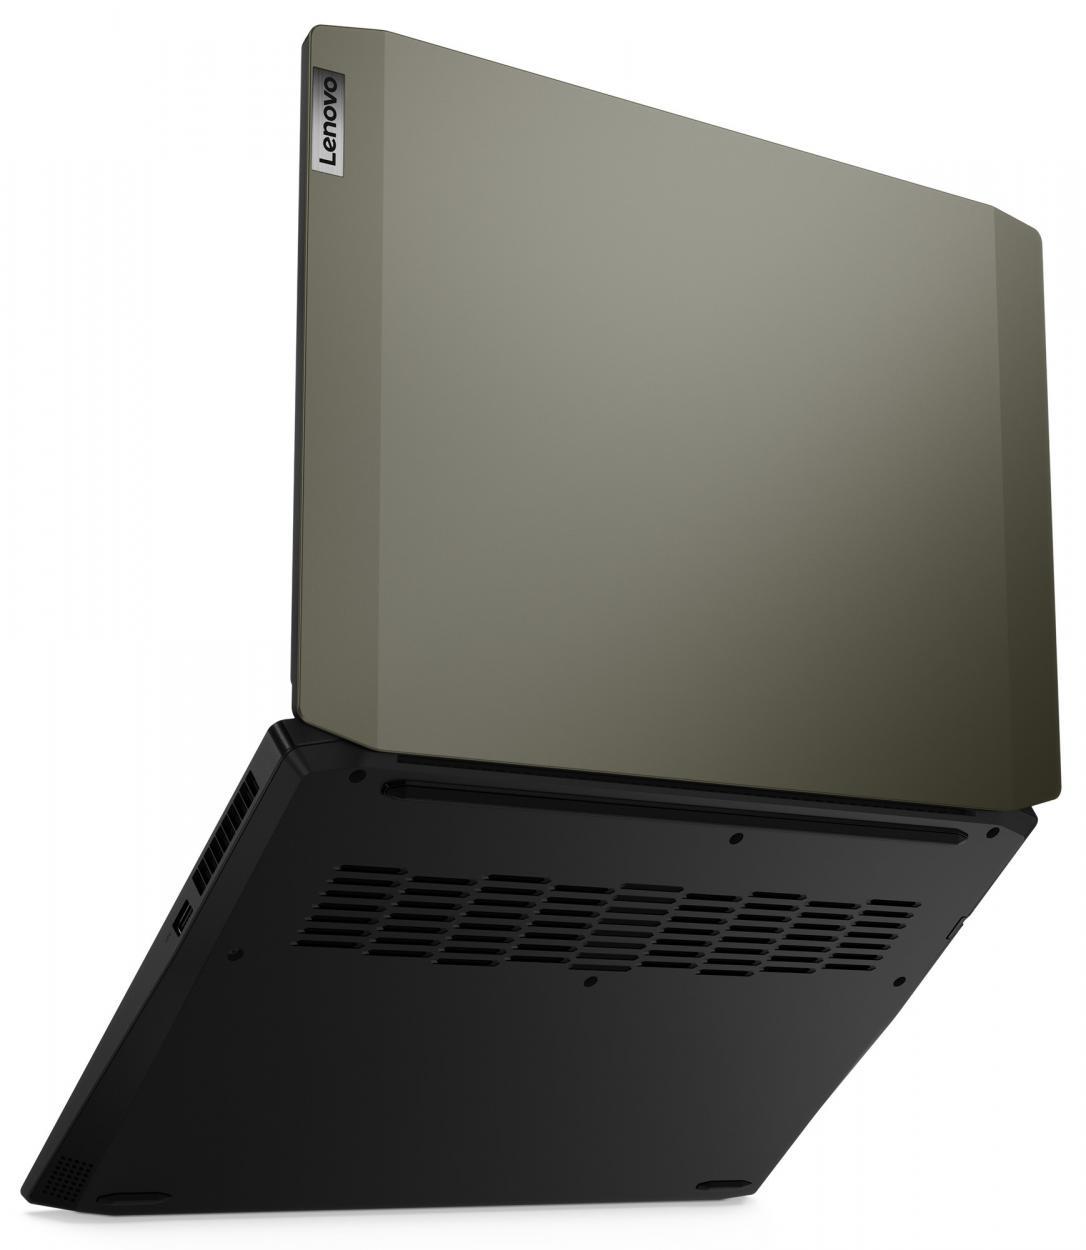 Ordinateur portable Lenovo  IdeaPad Creator 5 15IMH05 (82D4004WFR) Vert Kaki - GTX 1650 Ti, 144Hz - photo 6